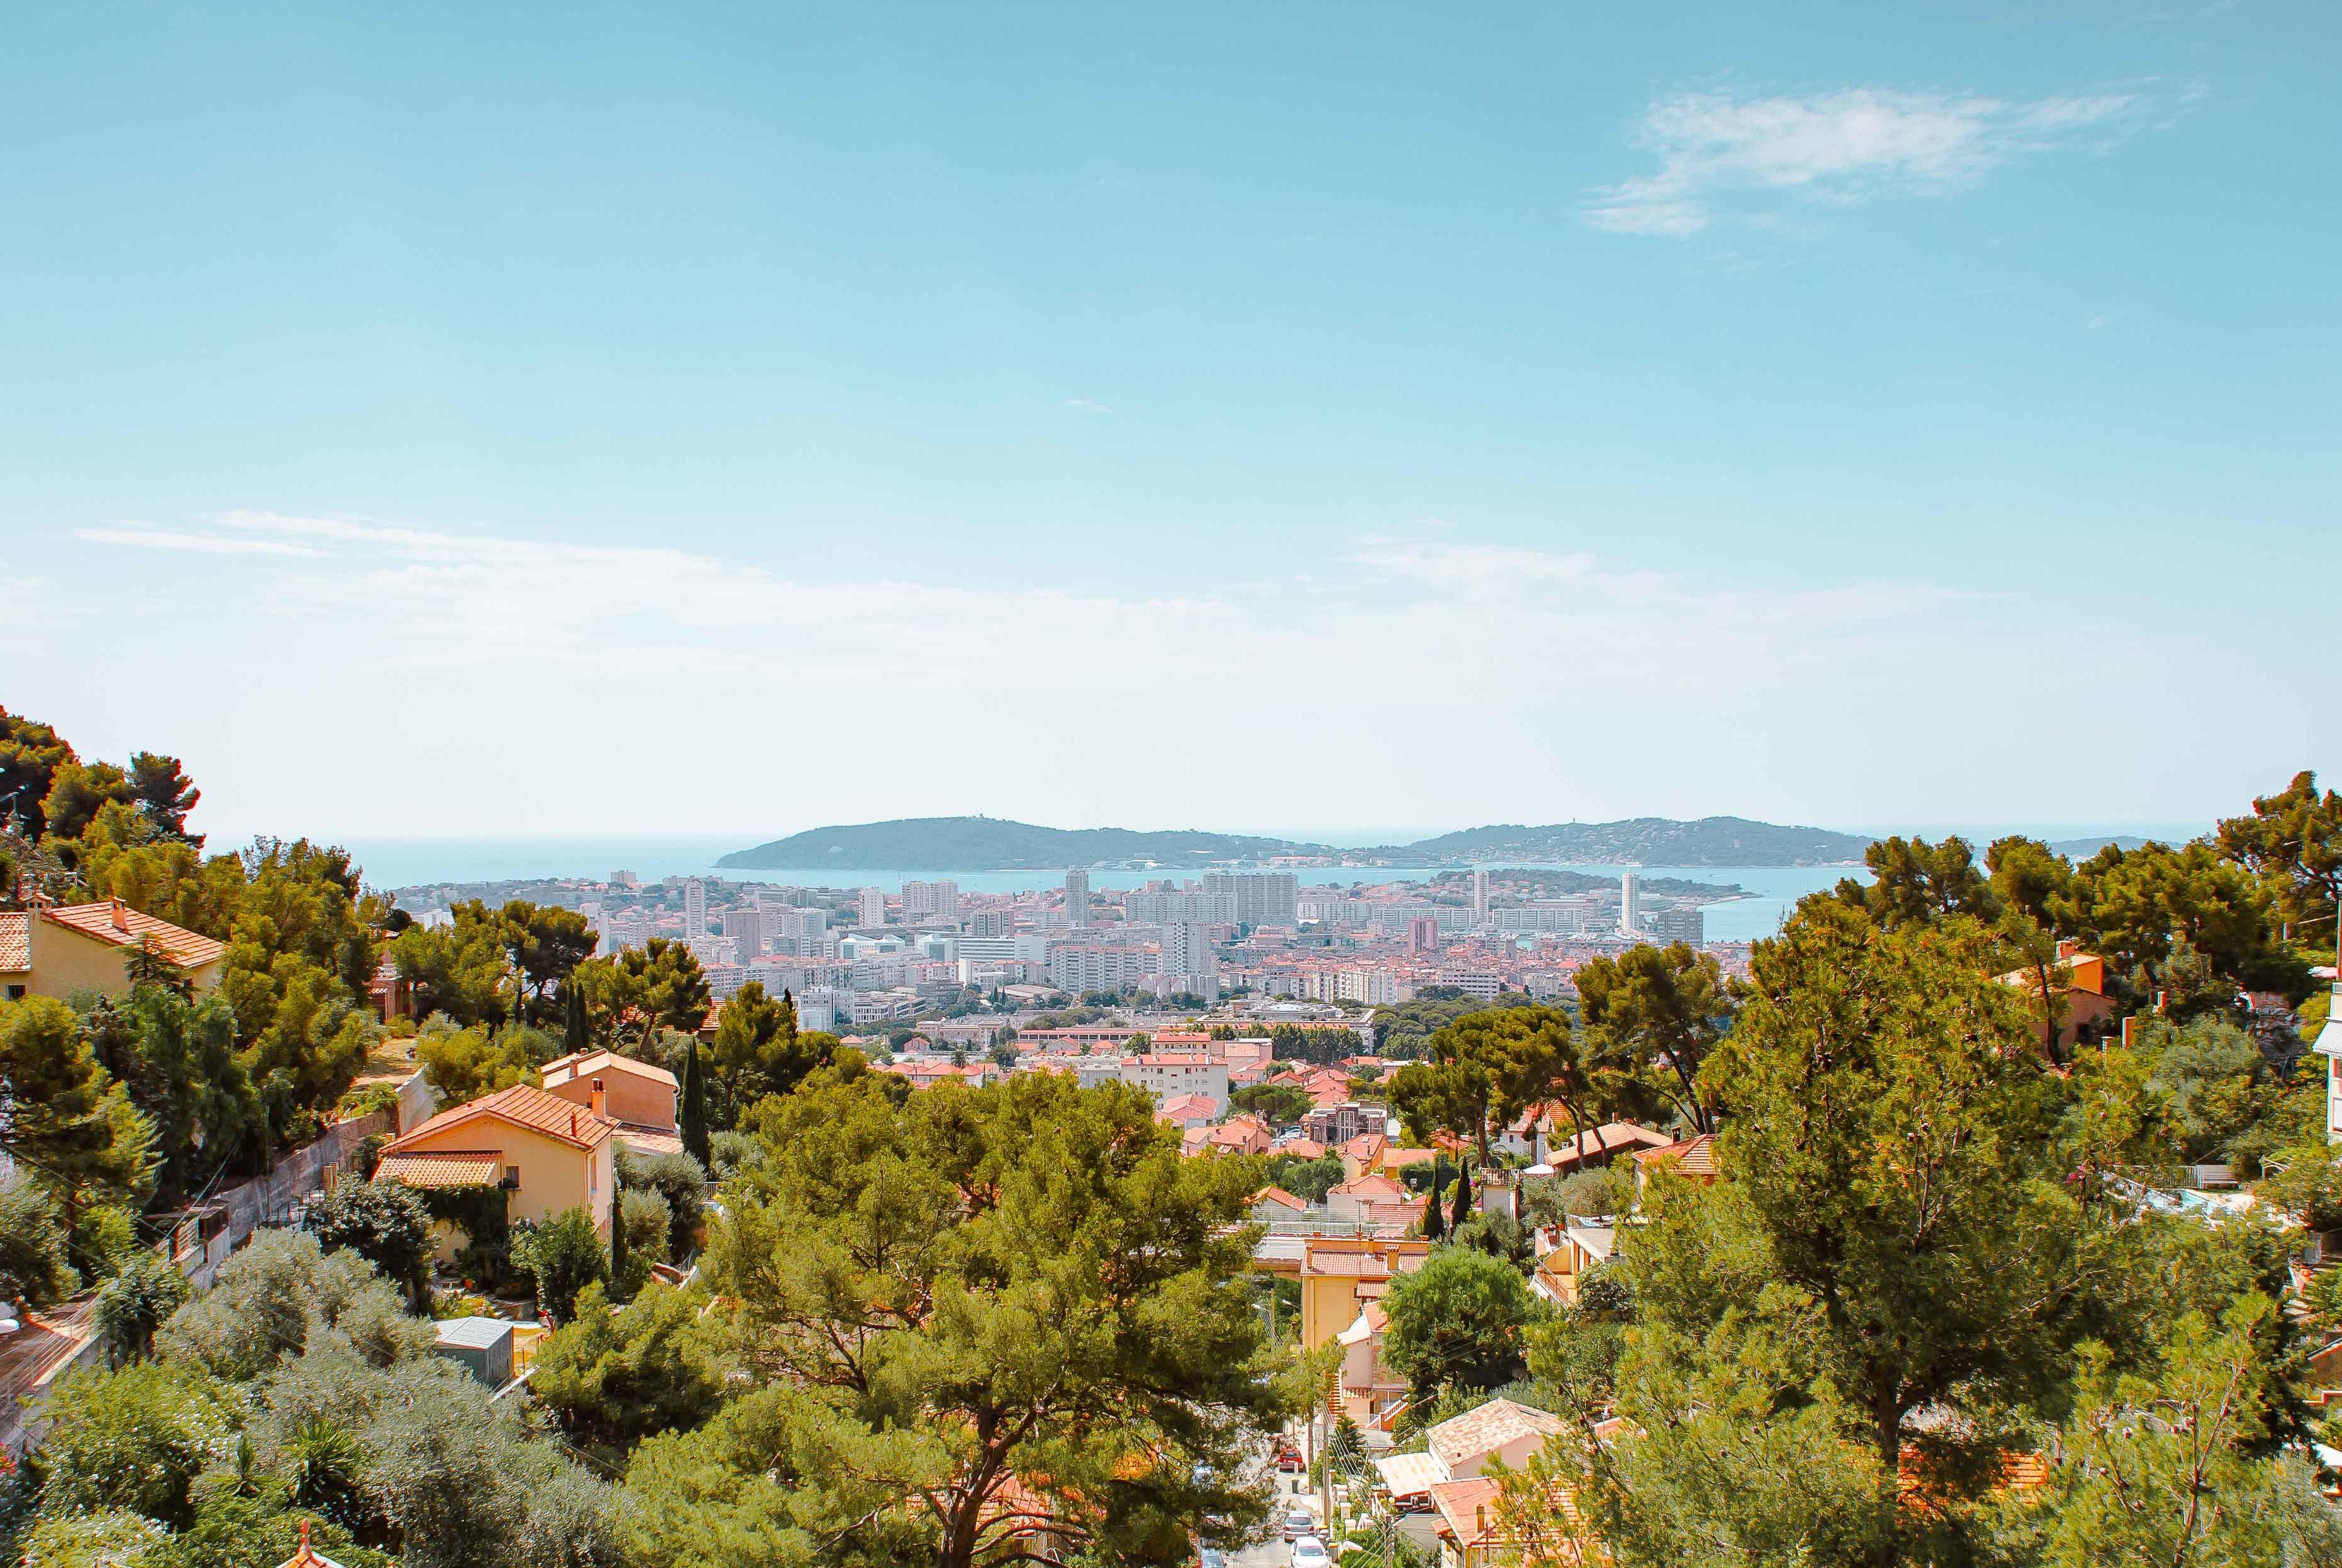 Because Toulon